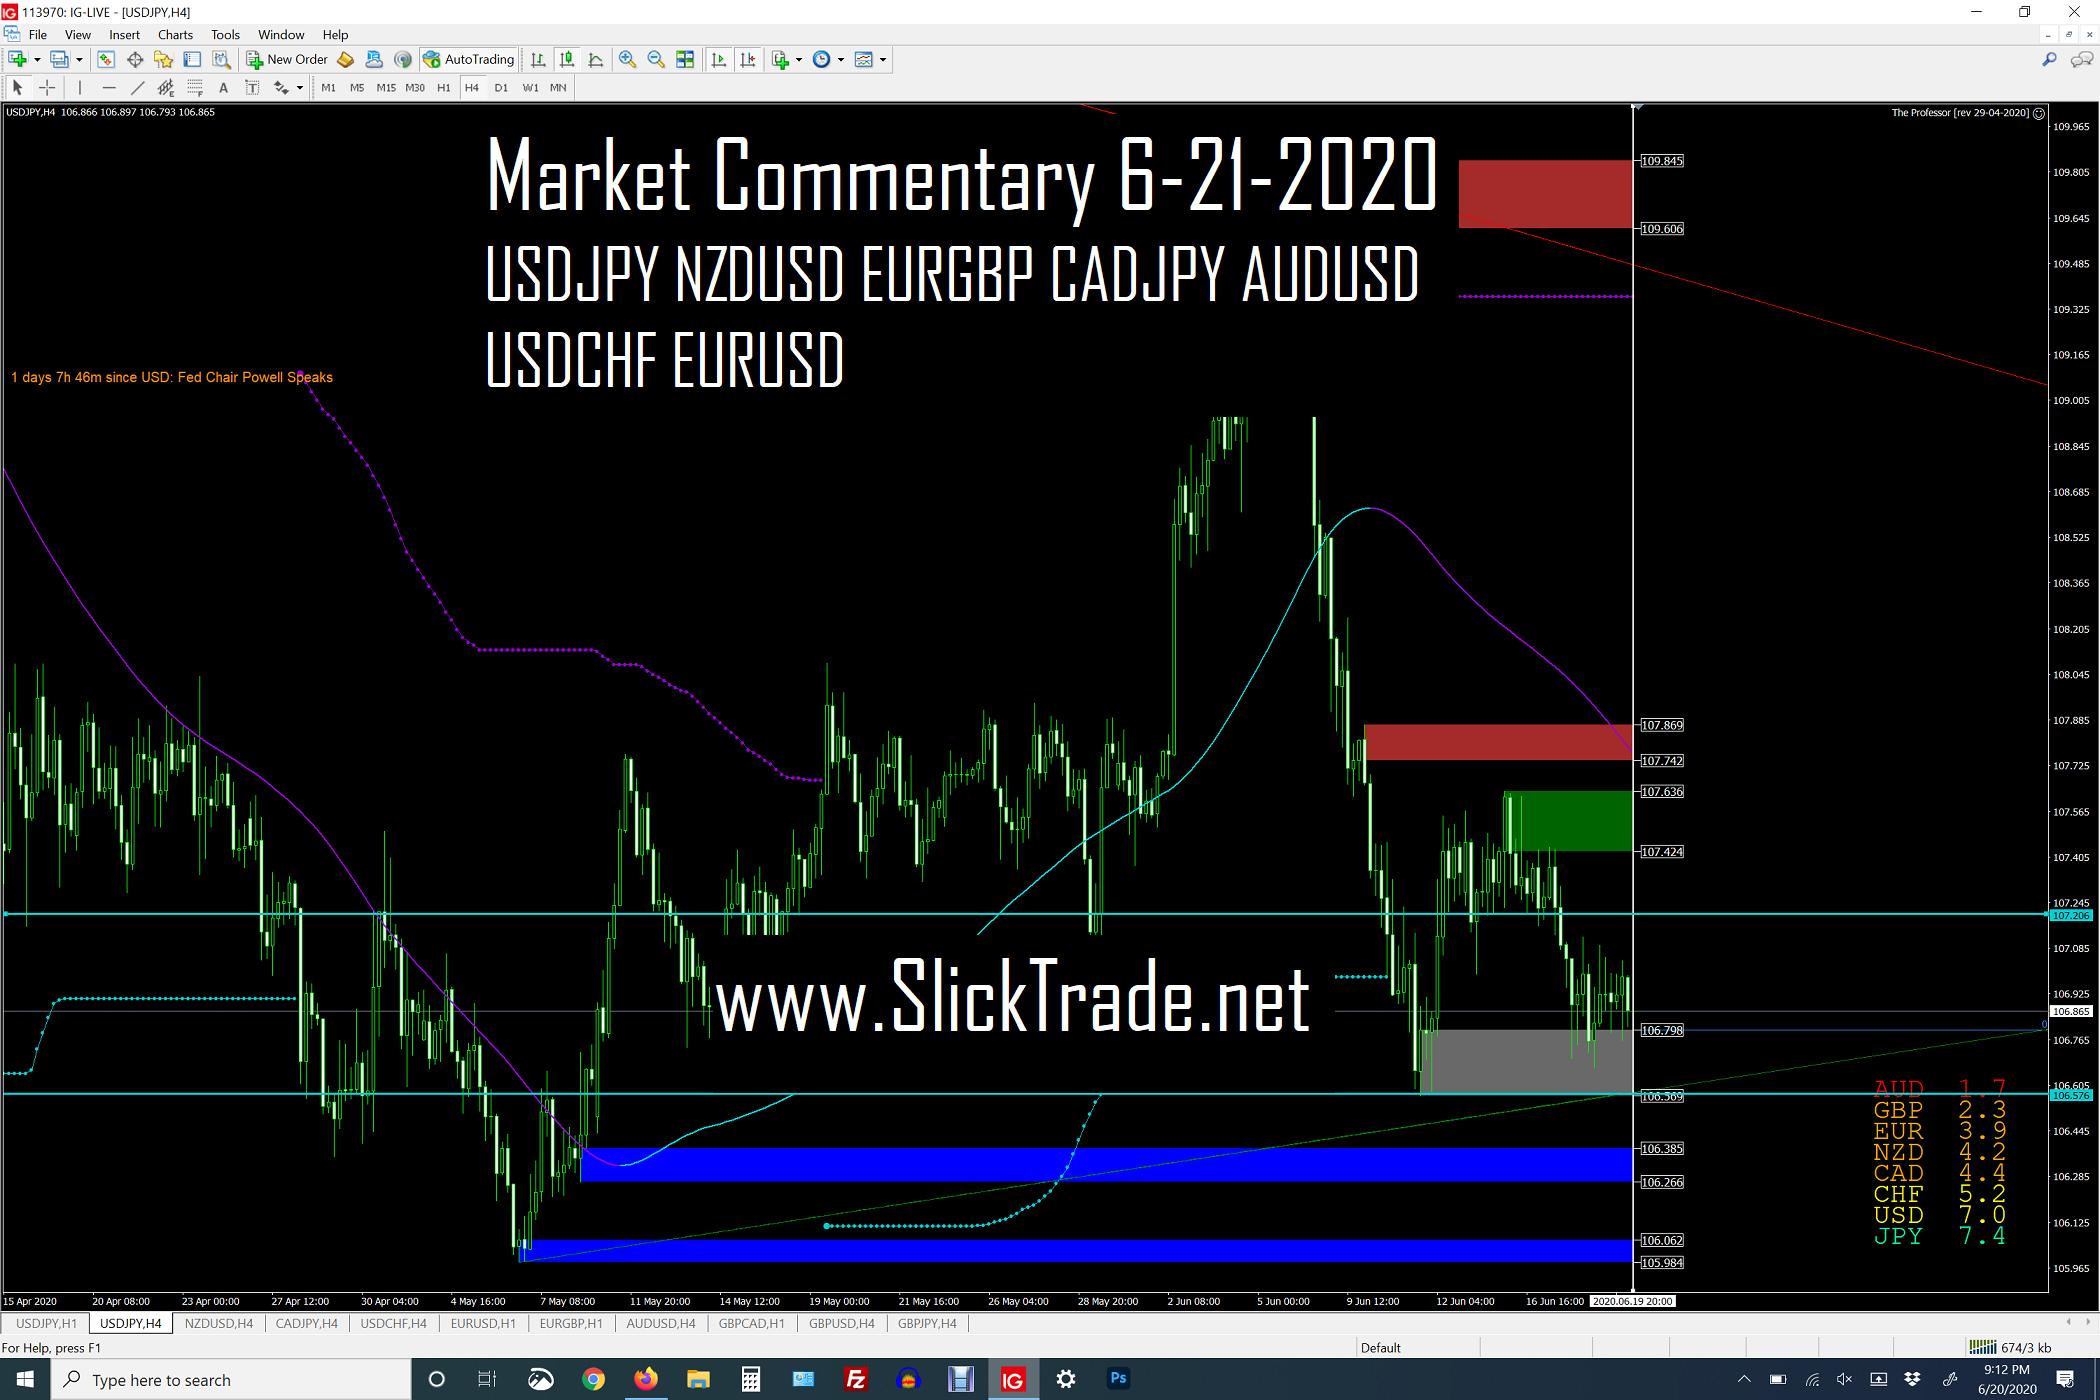 Market Commentary 6-21-2020 - USDJPY NZDUSD EURGBP CADJPY AUDUSD USDCHF EURUSD